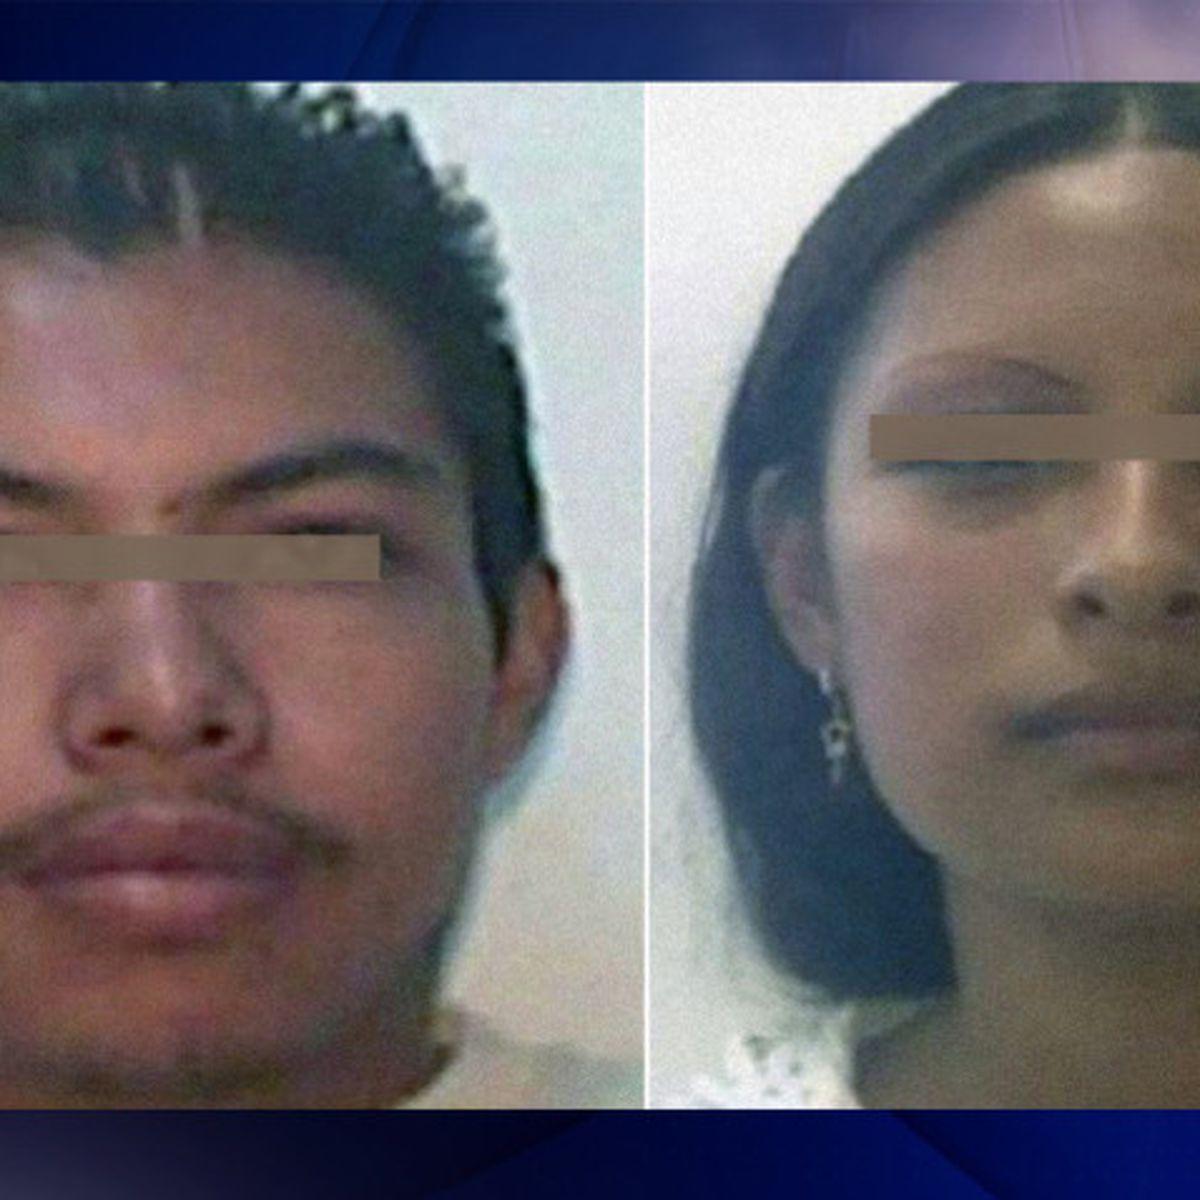 Capturan a pareja señalada como la que raptó y mató a Fátima